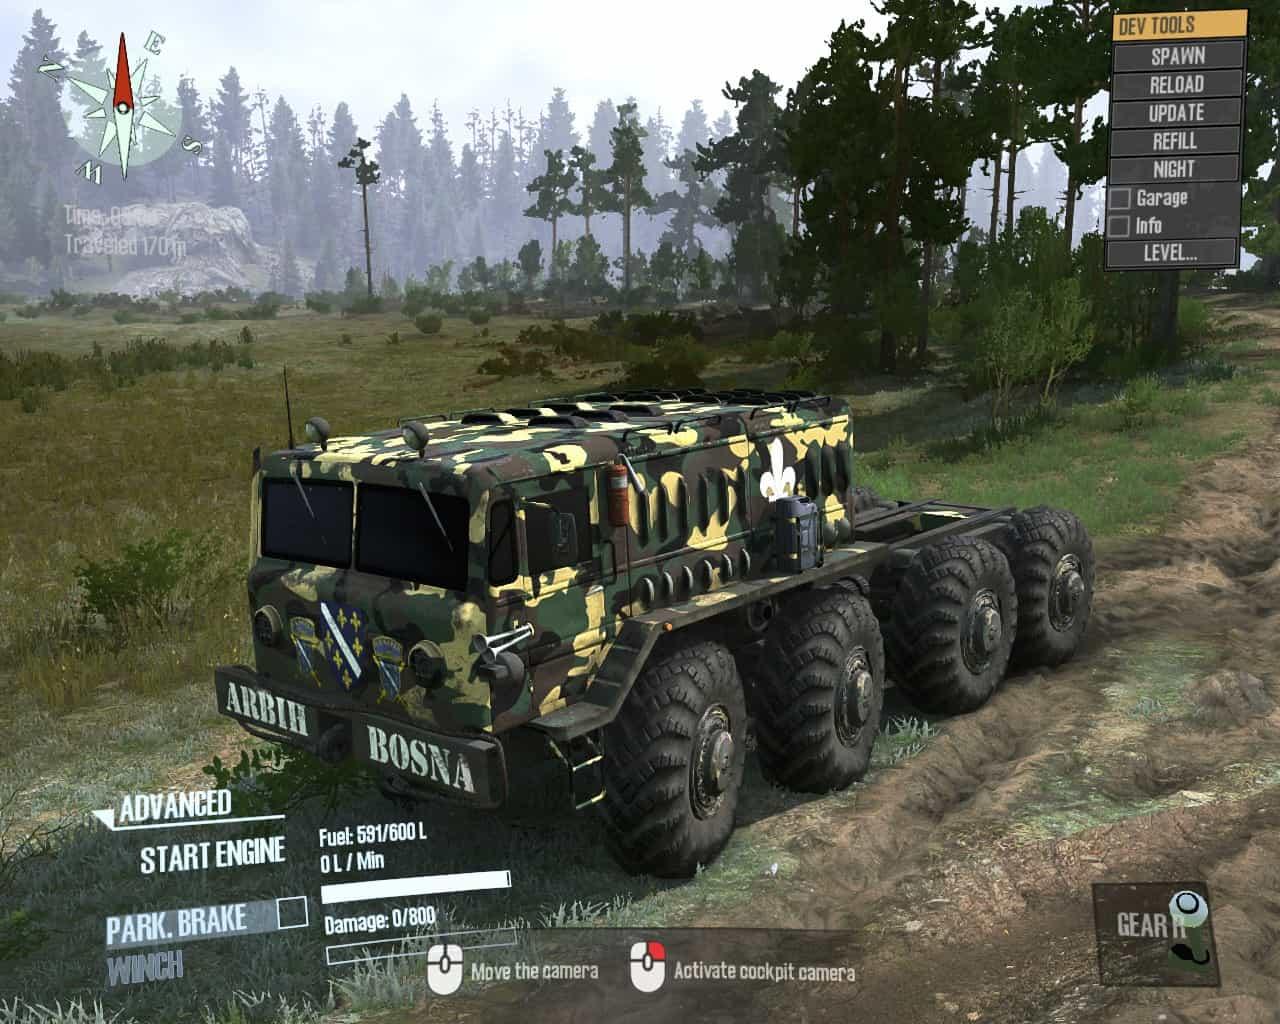 Spintires:Mudrunner - Maz 535 Bosnia Army Camo Style Bosna Truck